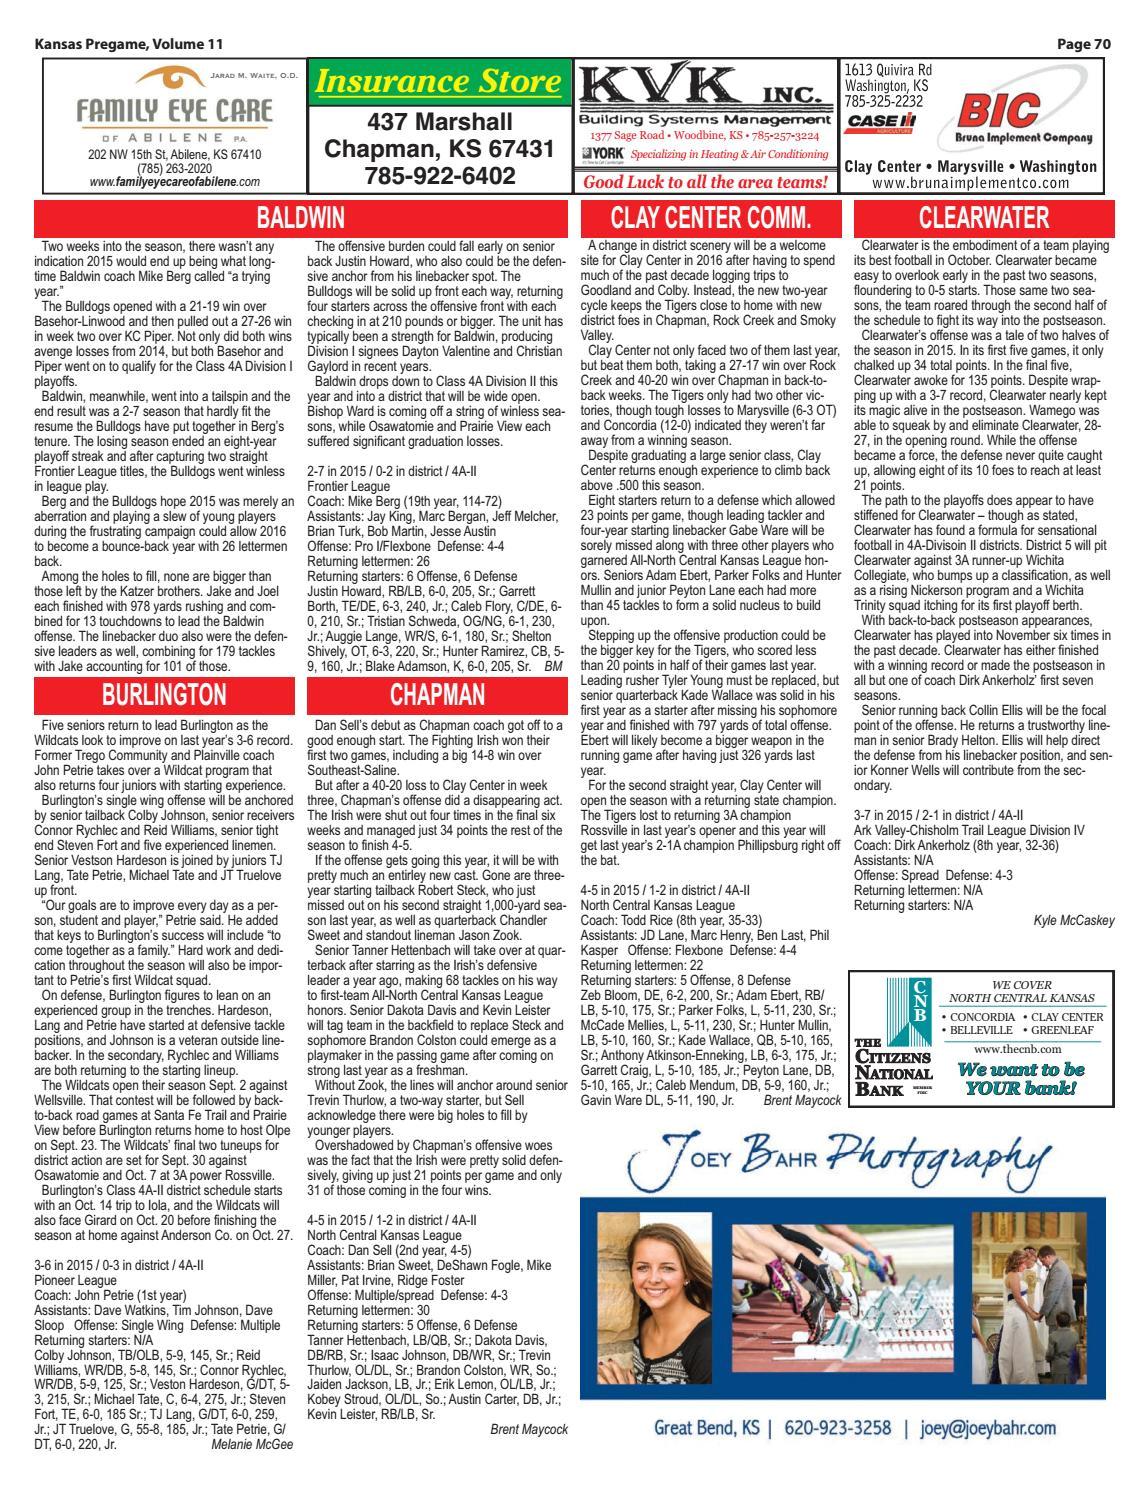 Chapman Heating and Cooling Dayton Wa Kansas Pregame Football Preview 2016 by Sixteen 60 Publishing Co